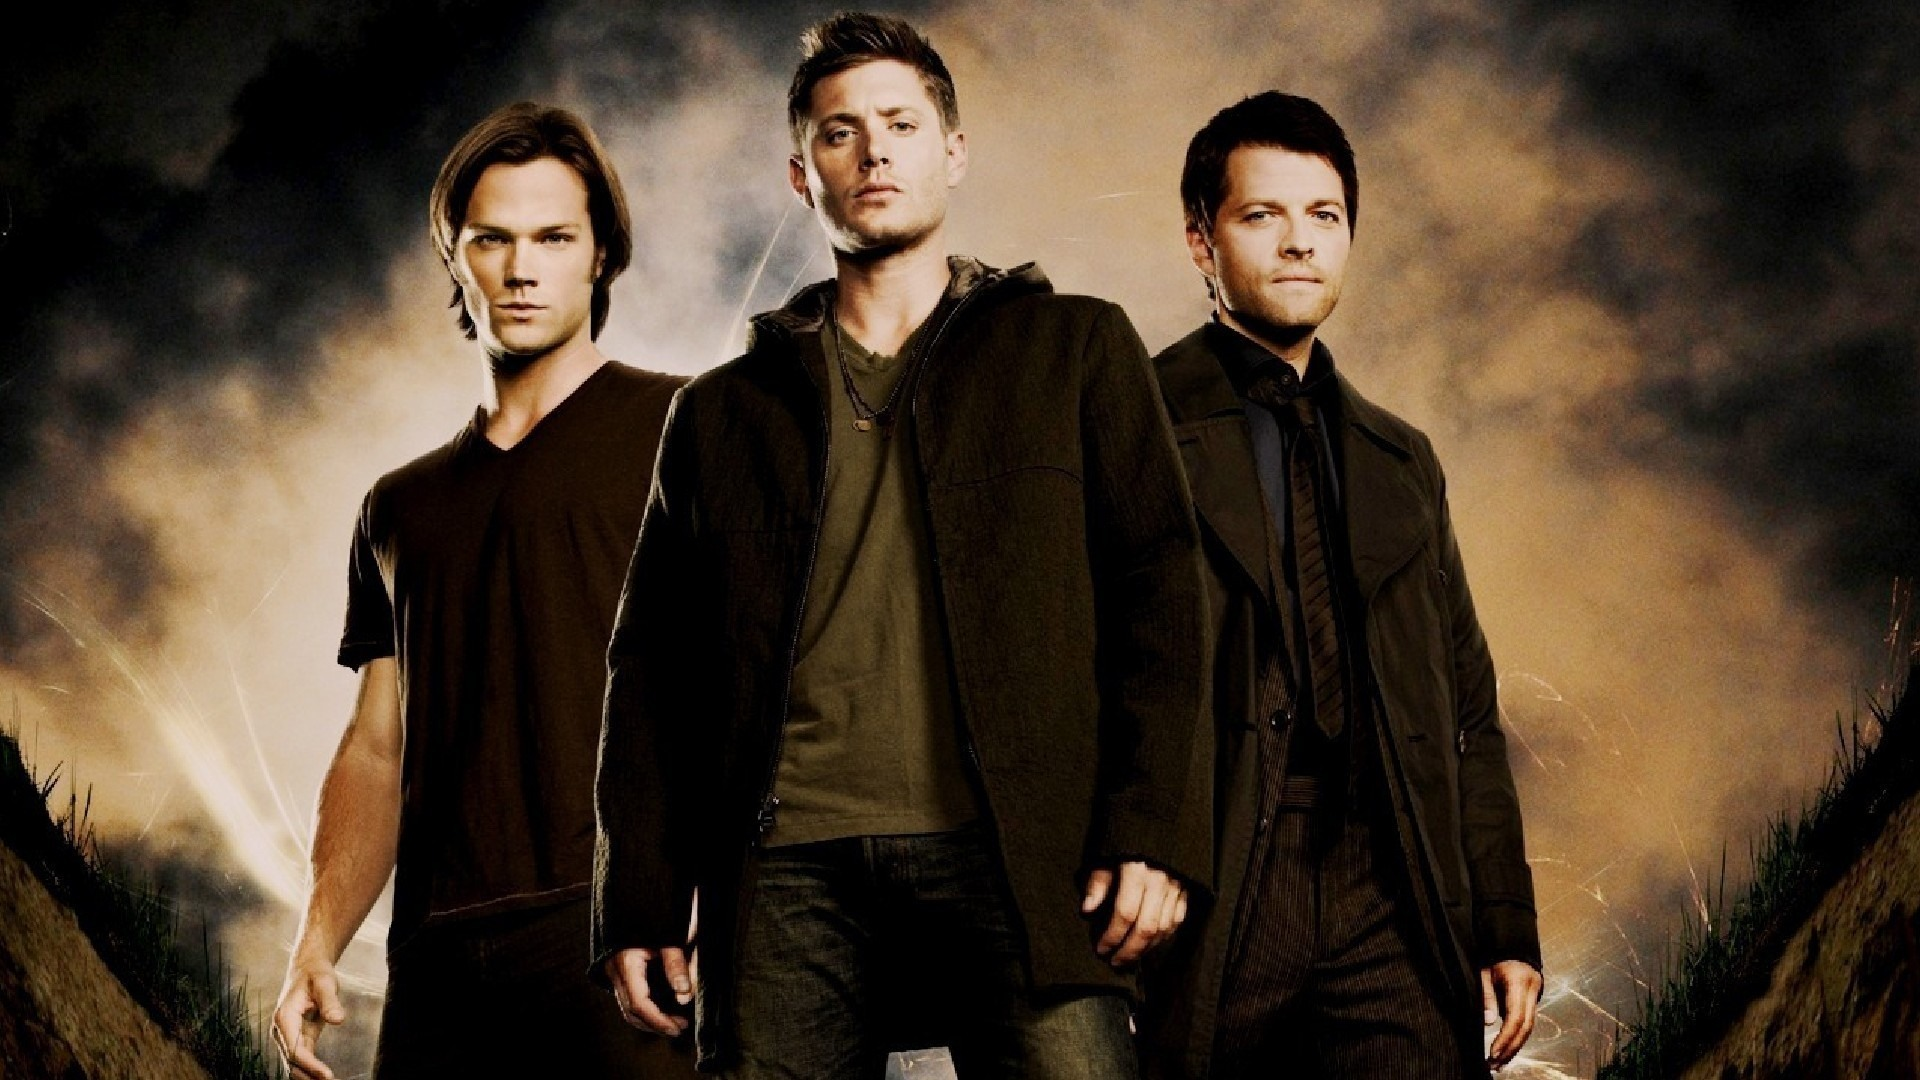 'Supernatural' temporada 14 confirmada, fechas de lanzamiento e historia